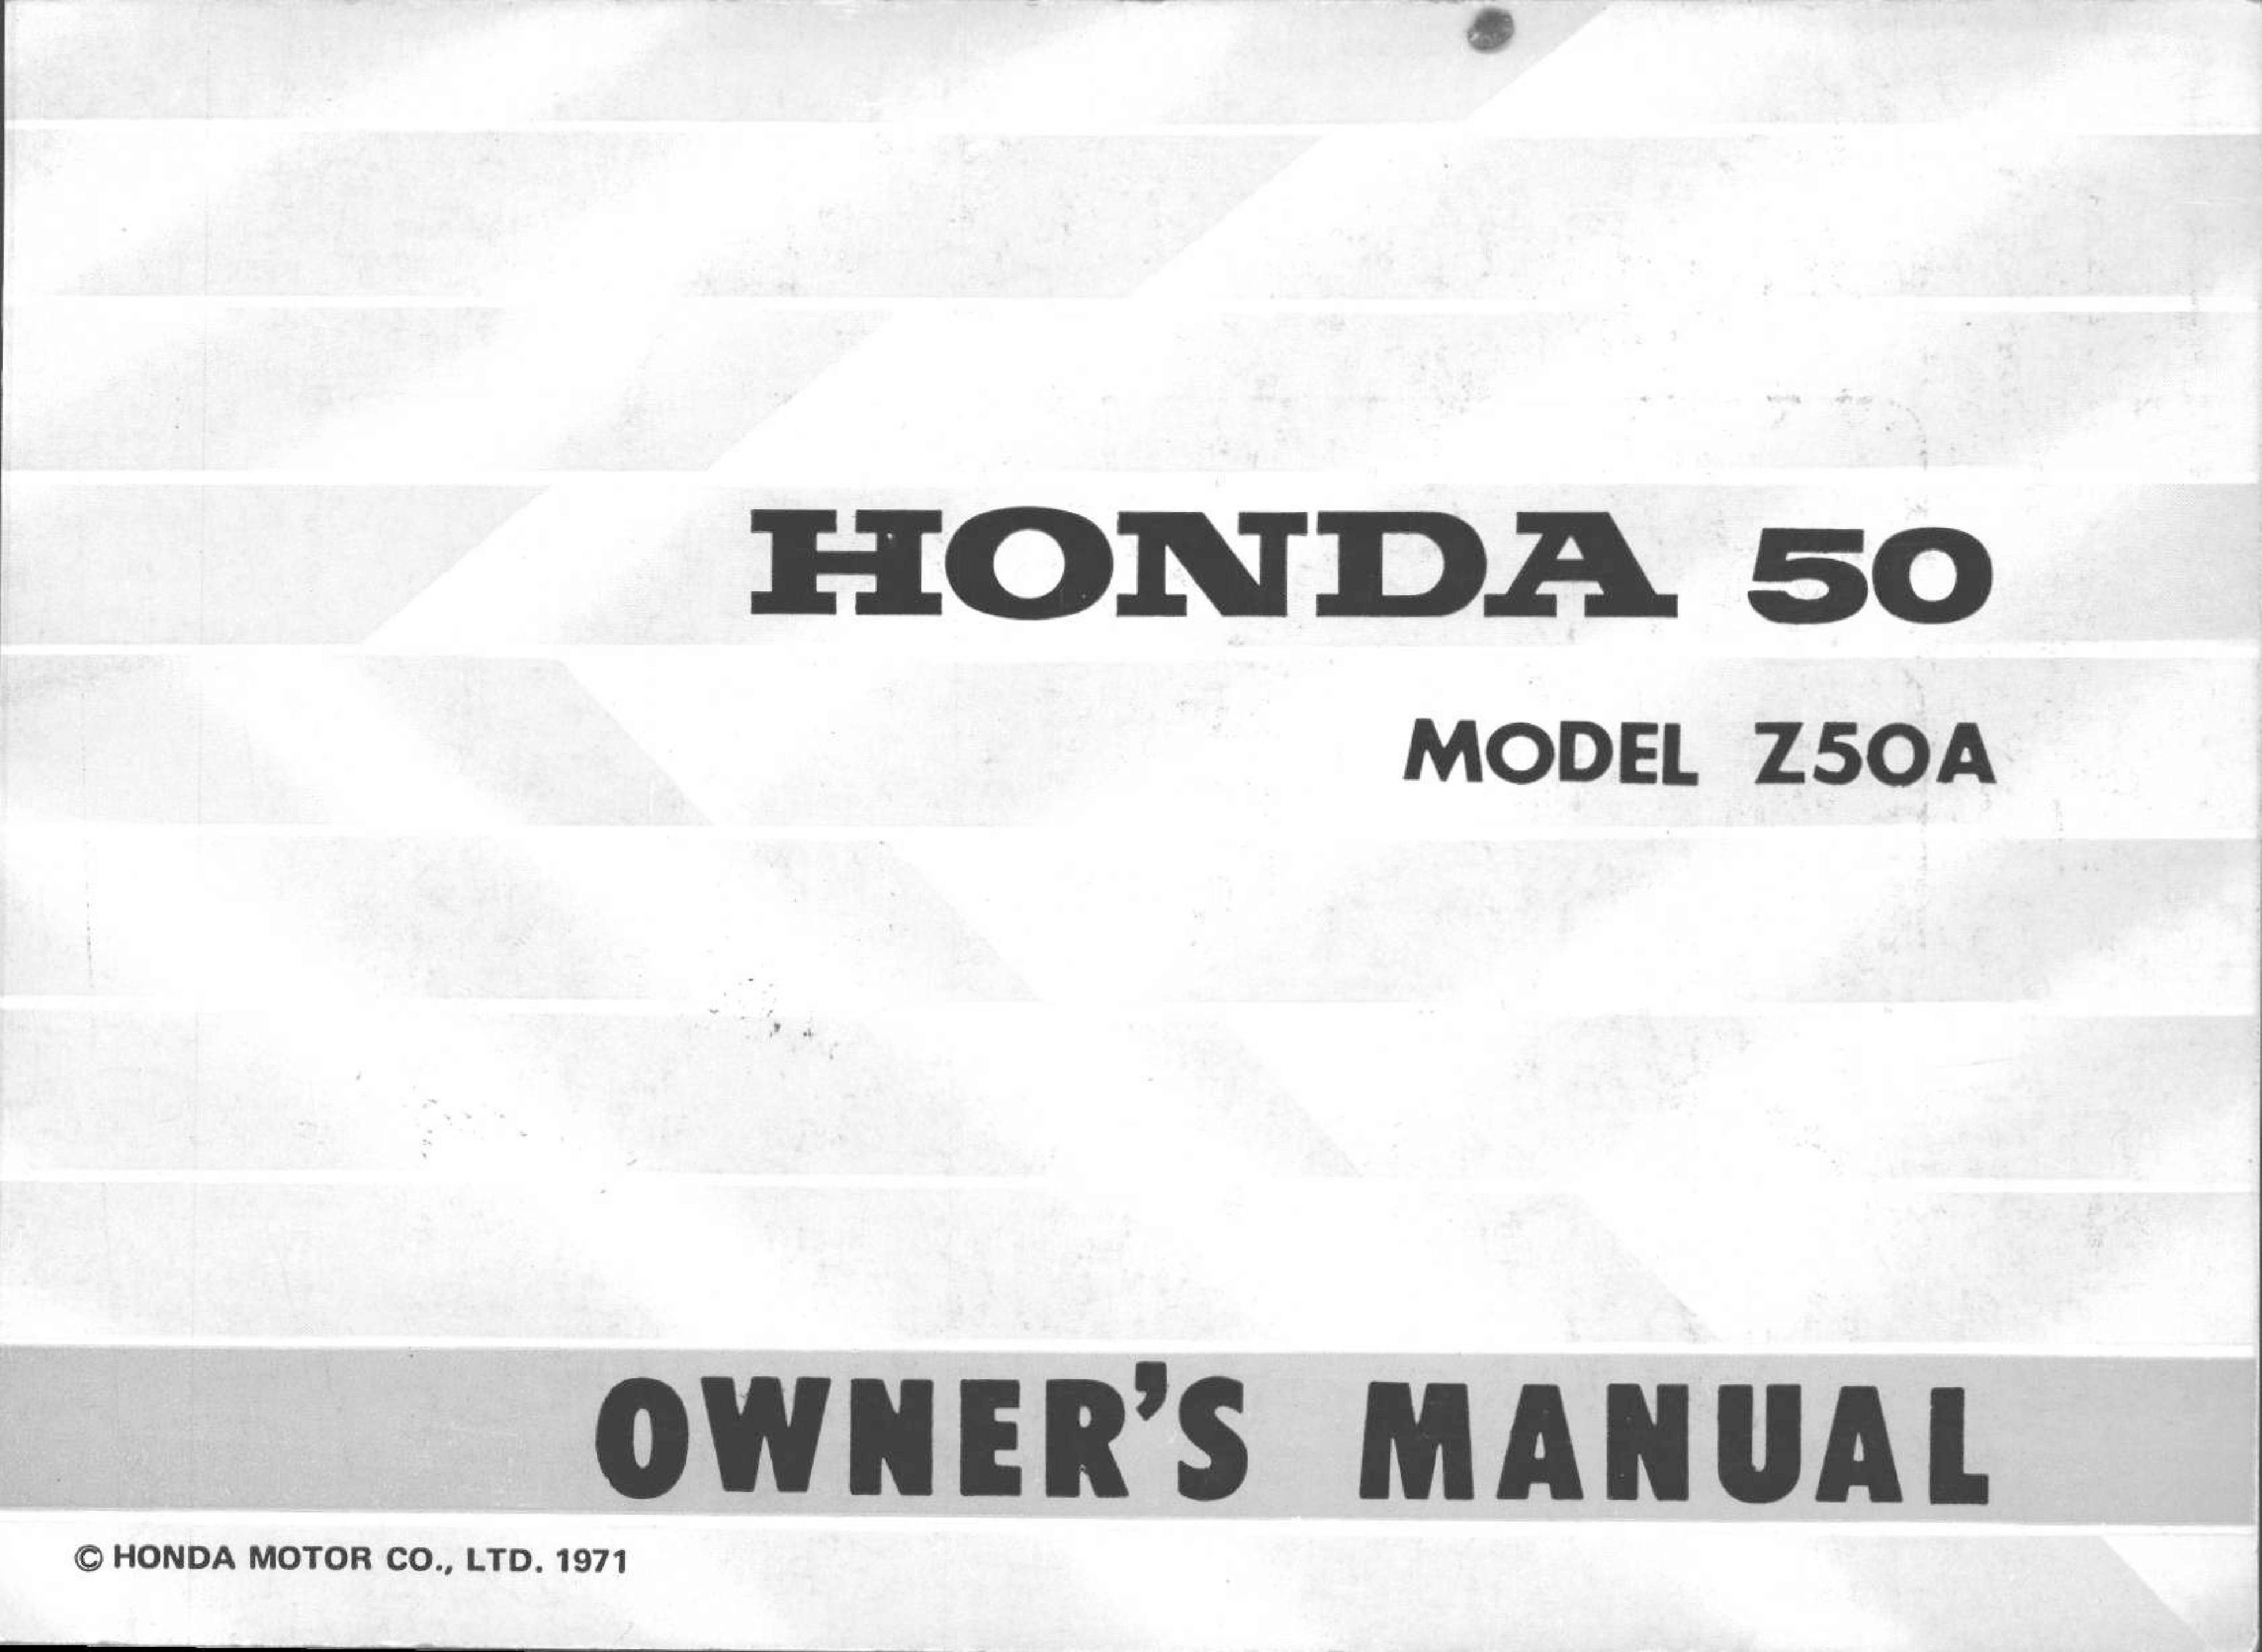 Owner's manual for Honda Z50A (1971)